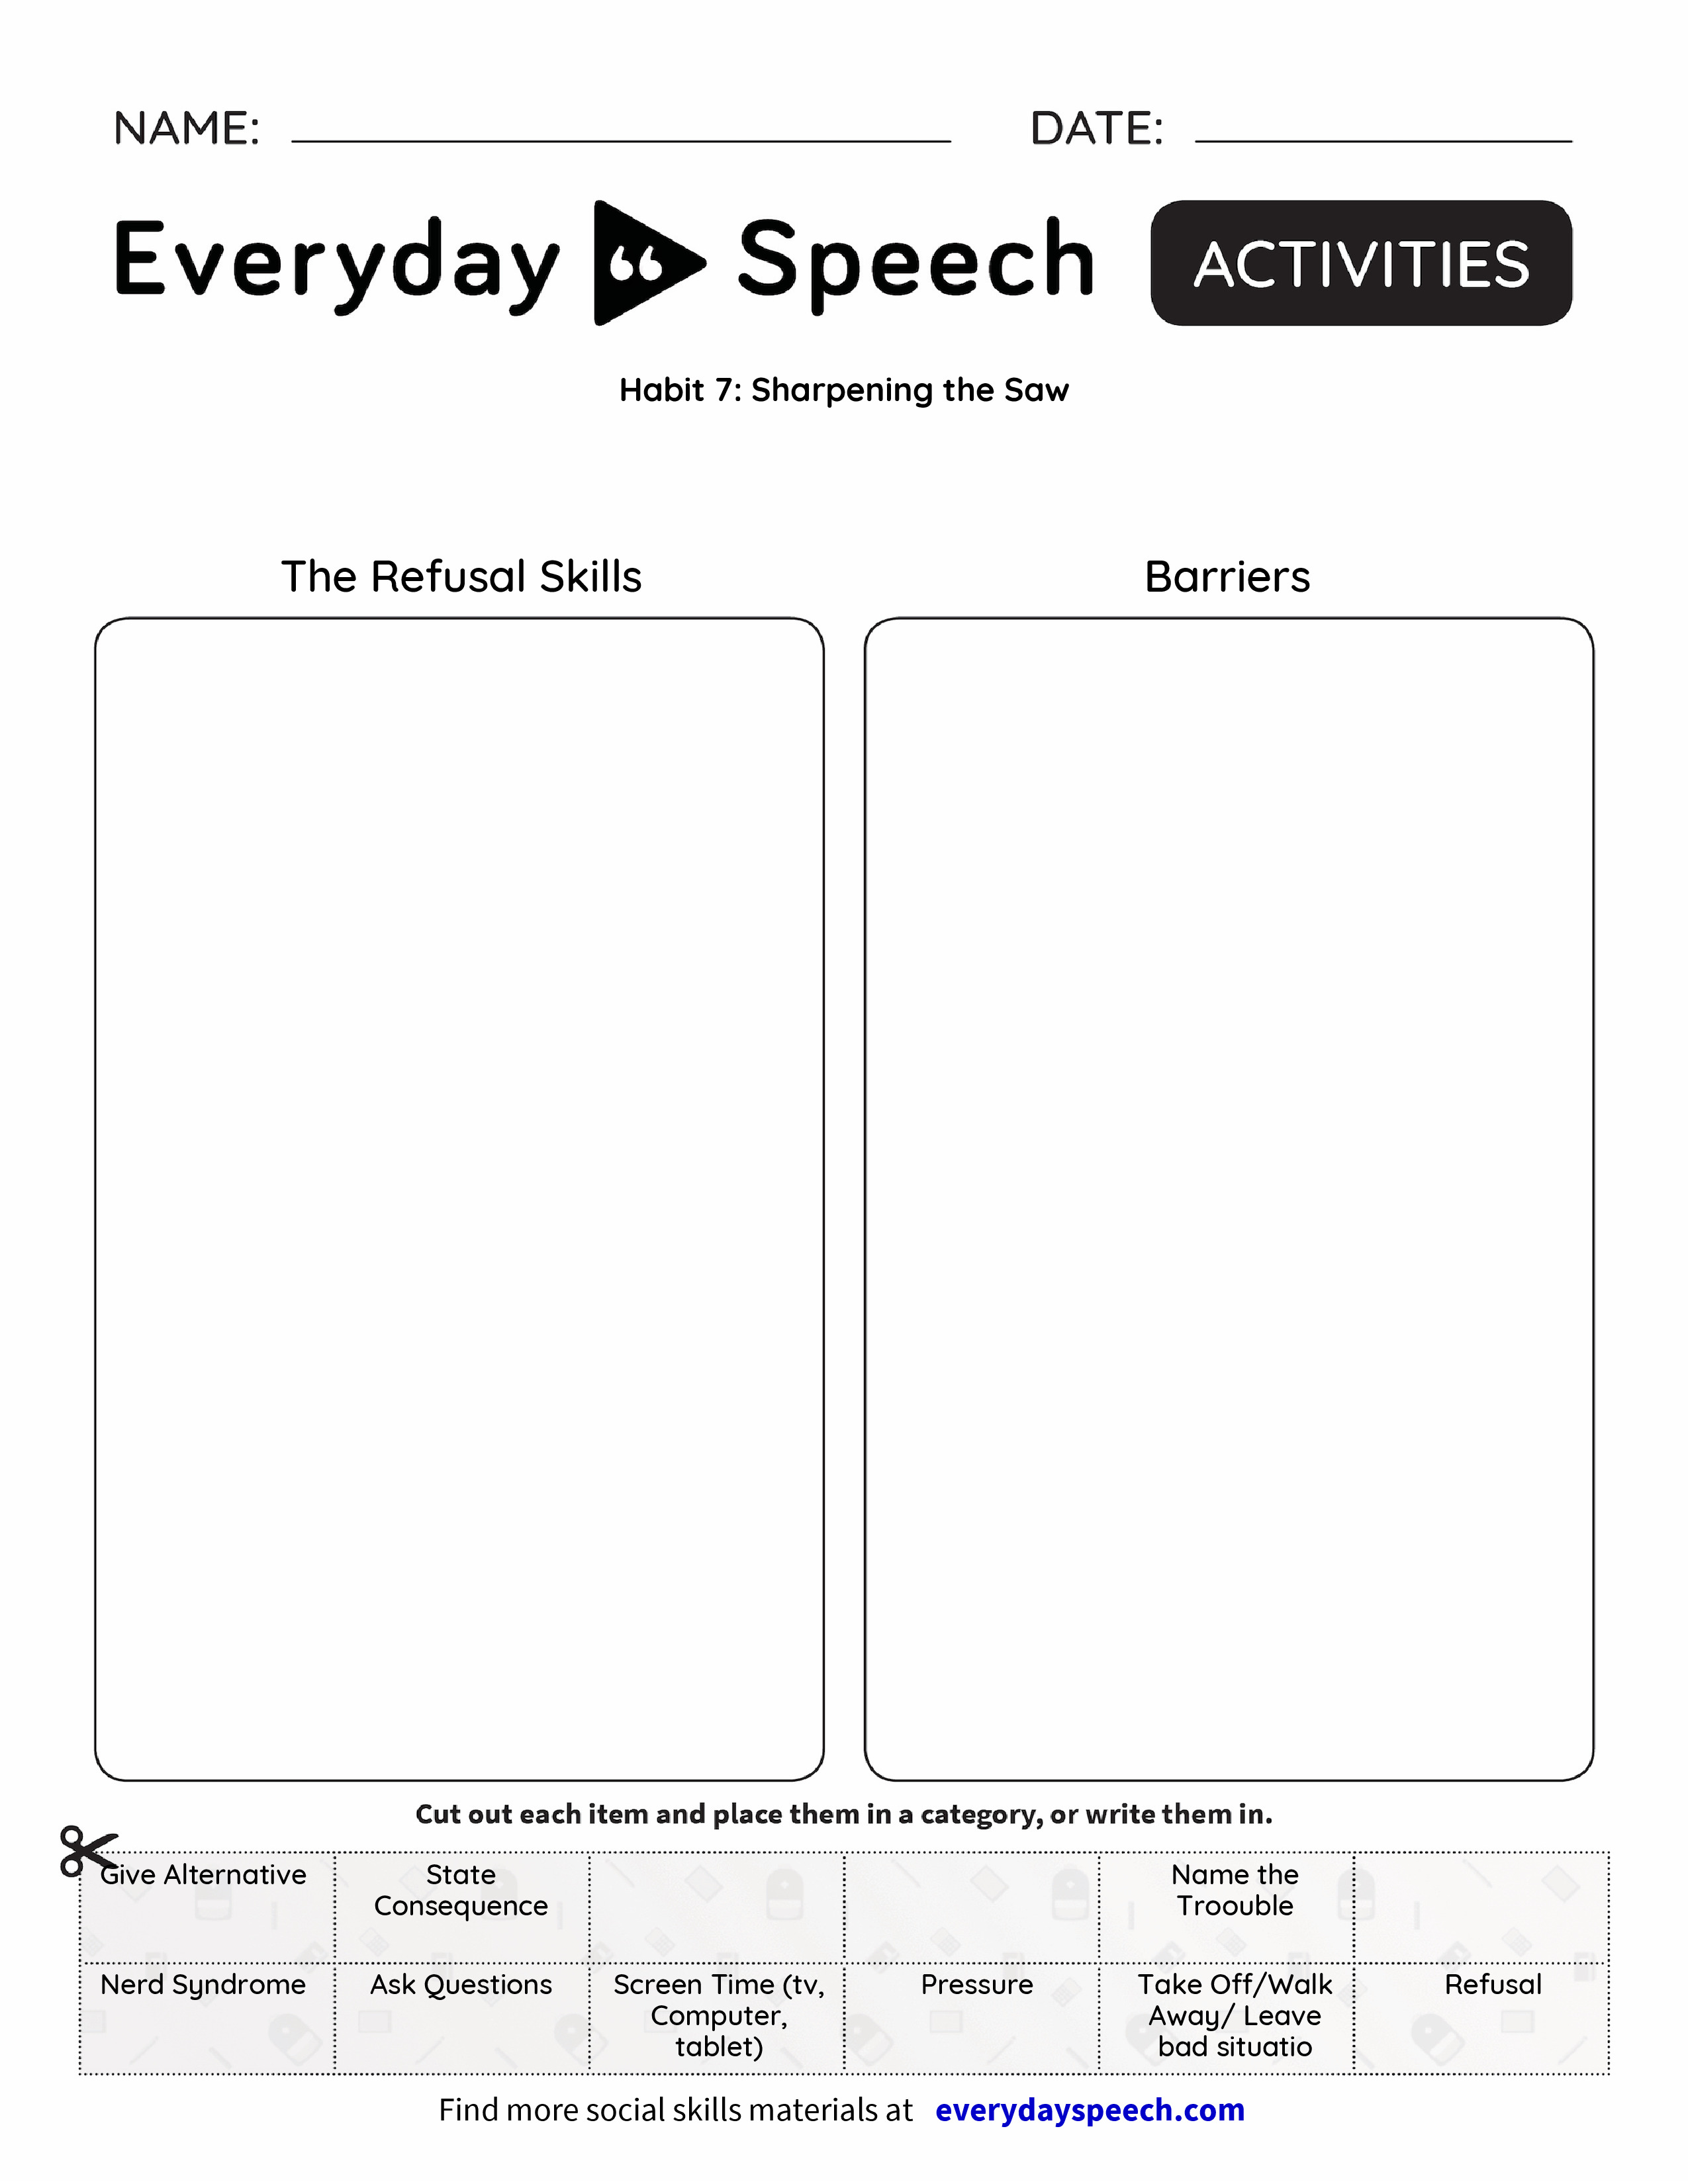 Habit 7: Sharpening the Saw - Everyday Speech - Everyday Speech